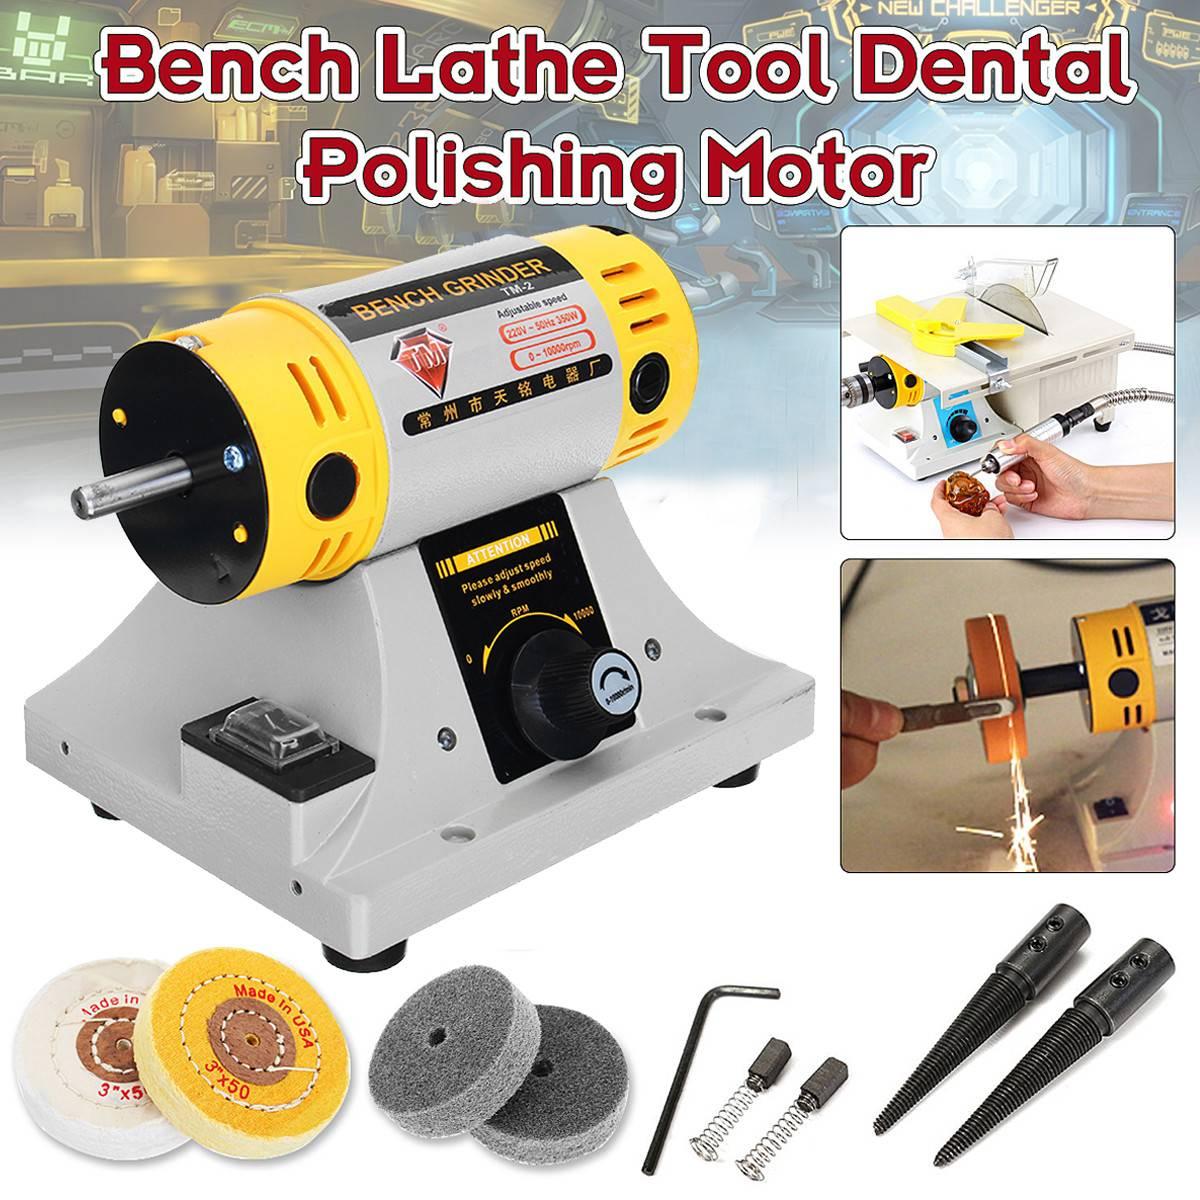 350W Steel Grinder Polishing Adjustable Speed Polishing Machine Motor Tool Lathe for Bench Grinder Kit  US/EU Plug Polisher machine tool